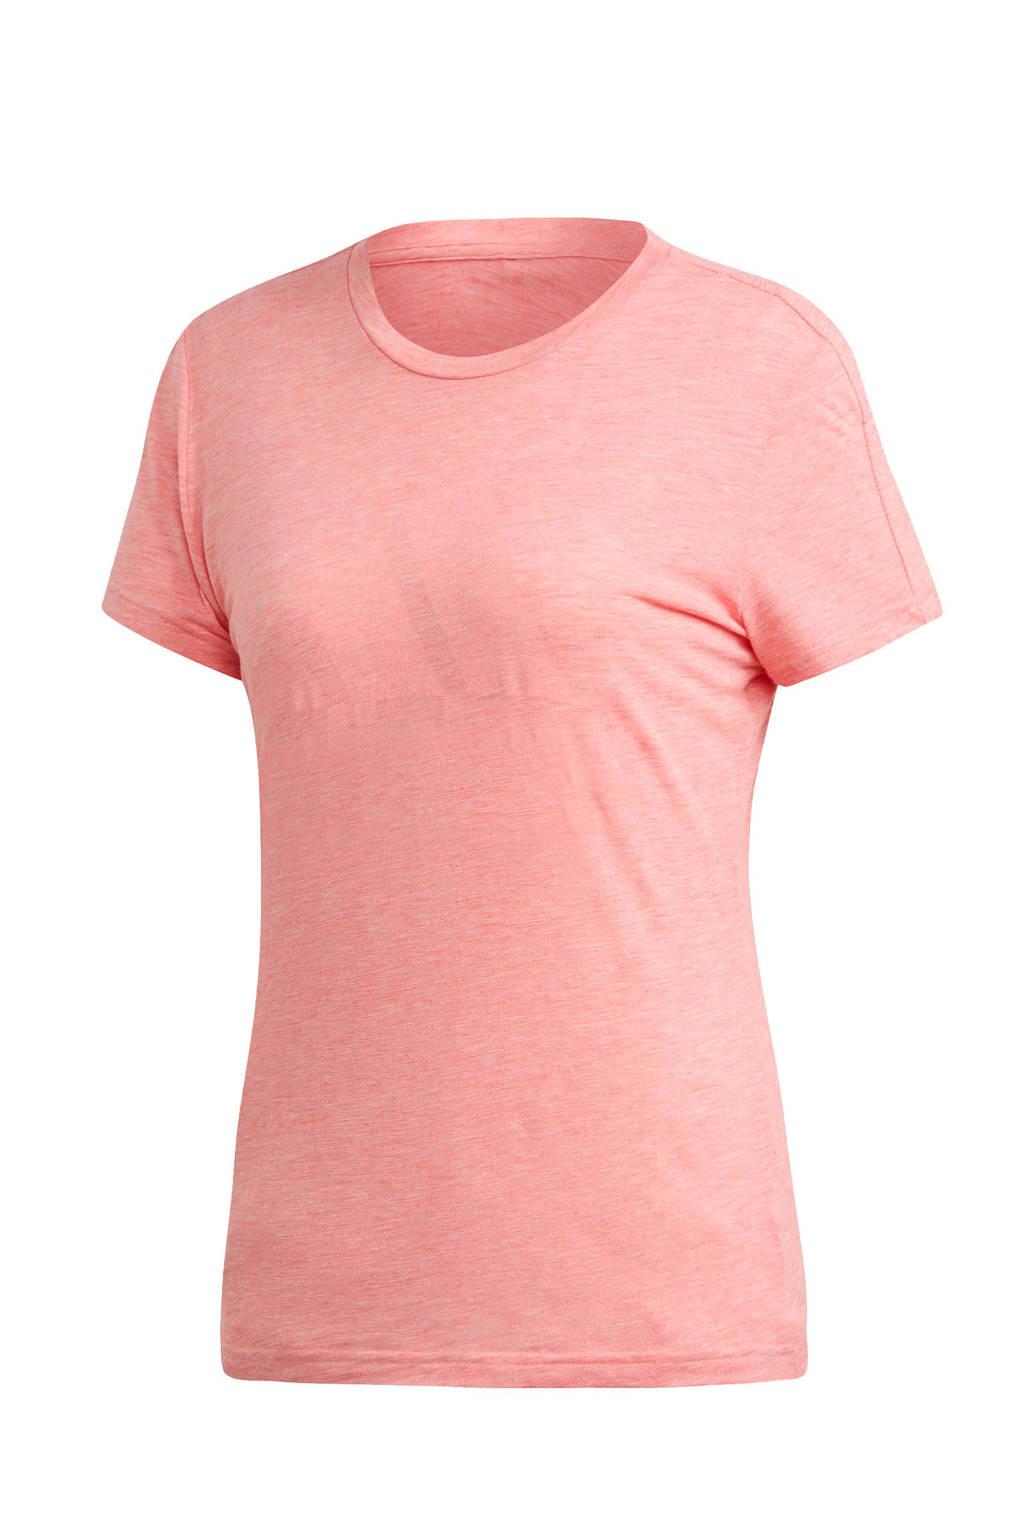 adidas Performance sport T-shirt rood/roze, Rood/roze